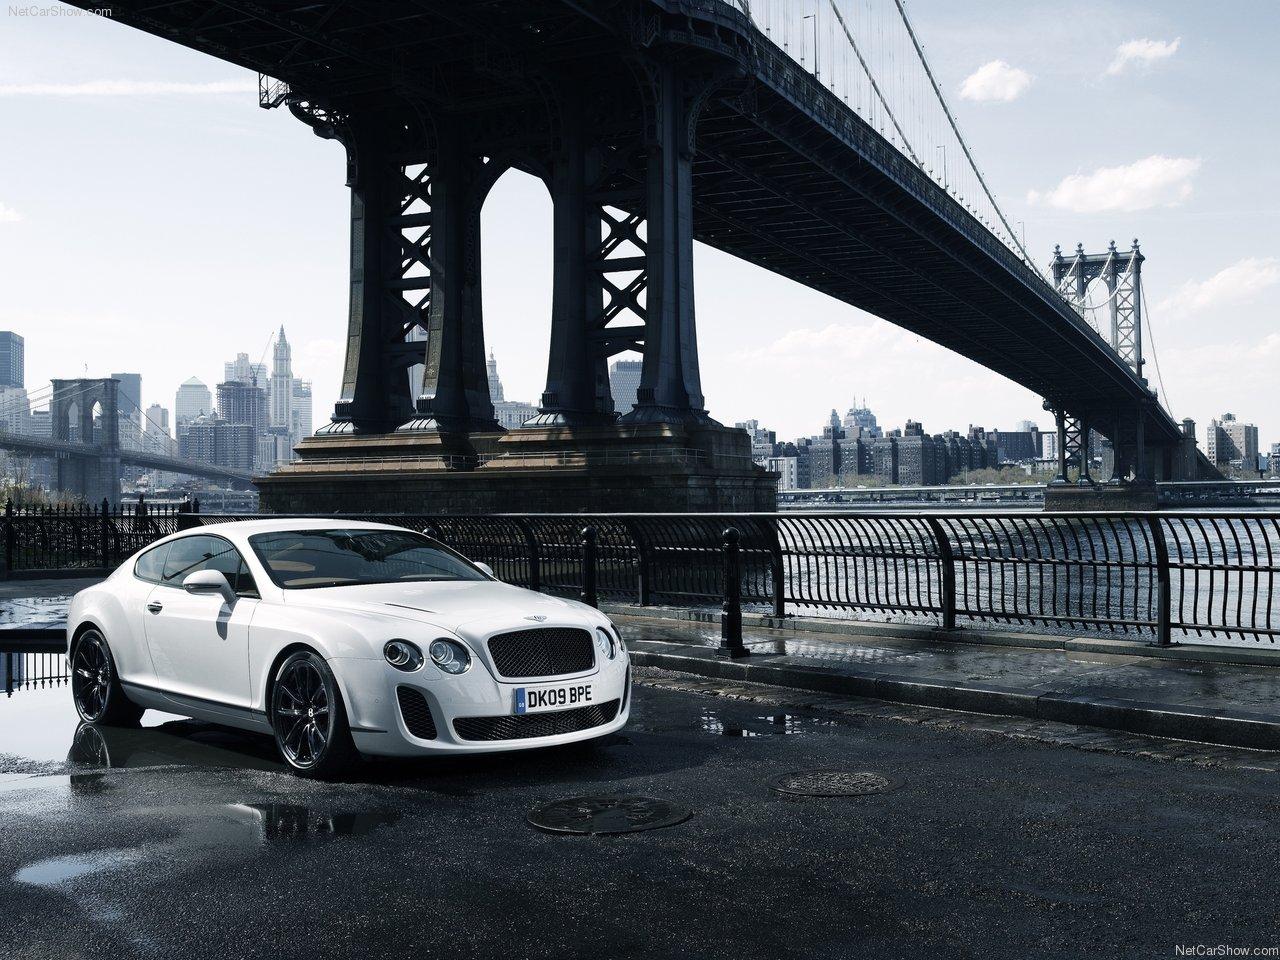 0_1521011713702_Bentley-Continental_Supersports-2010-1280-03.jpg